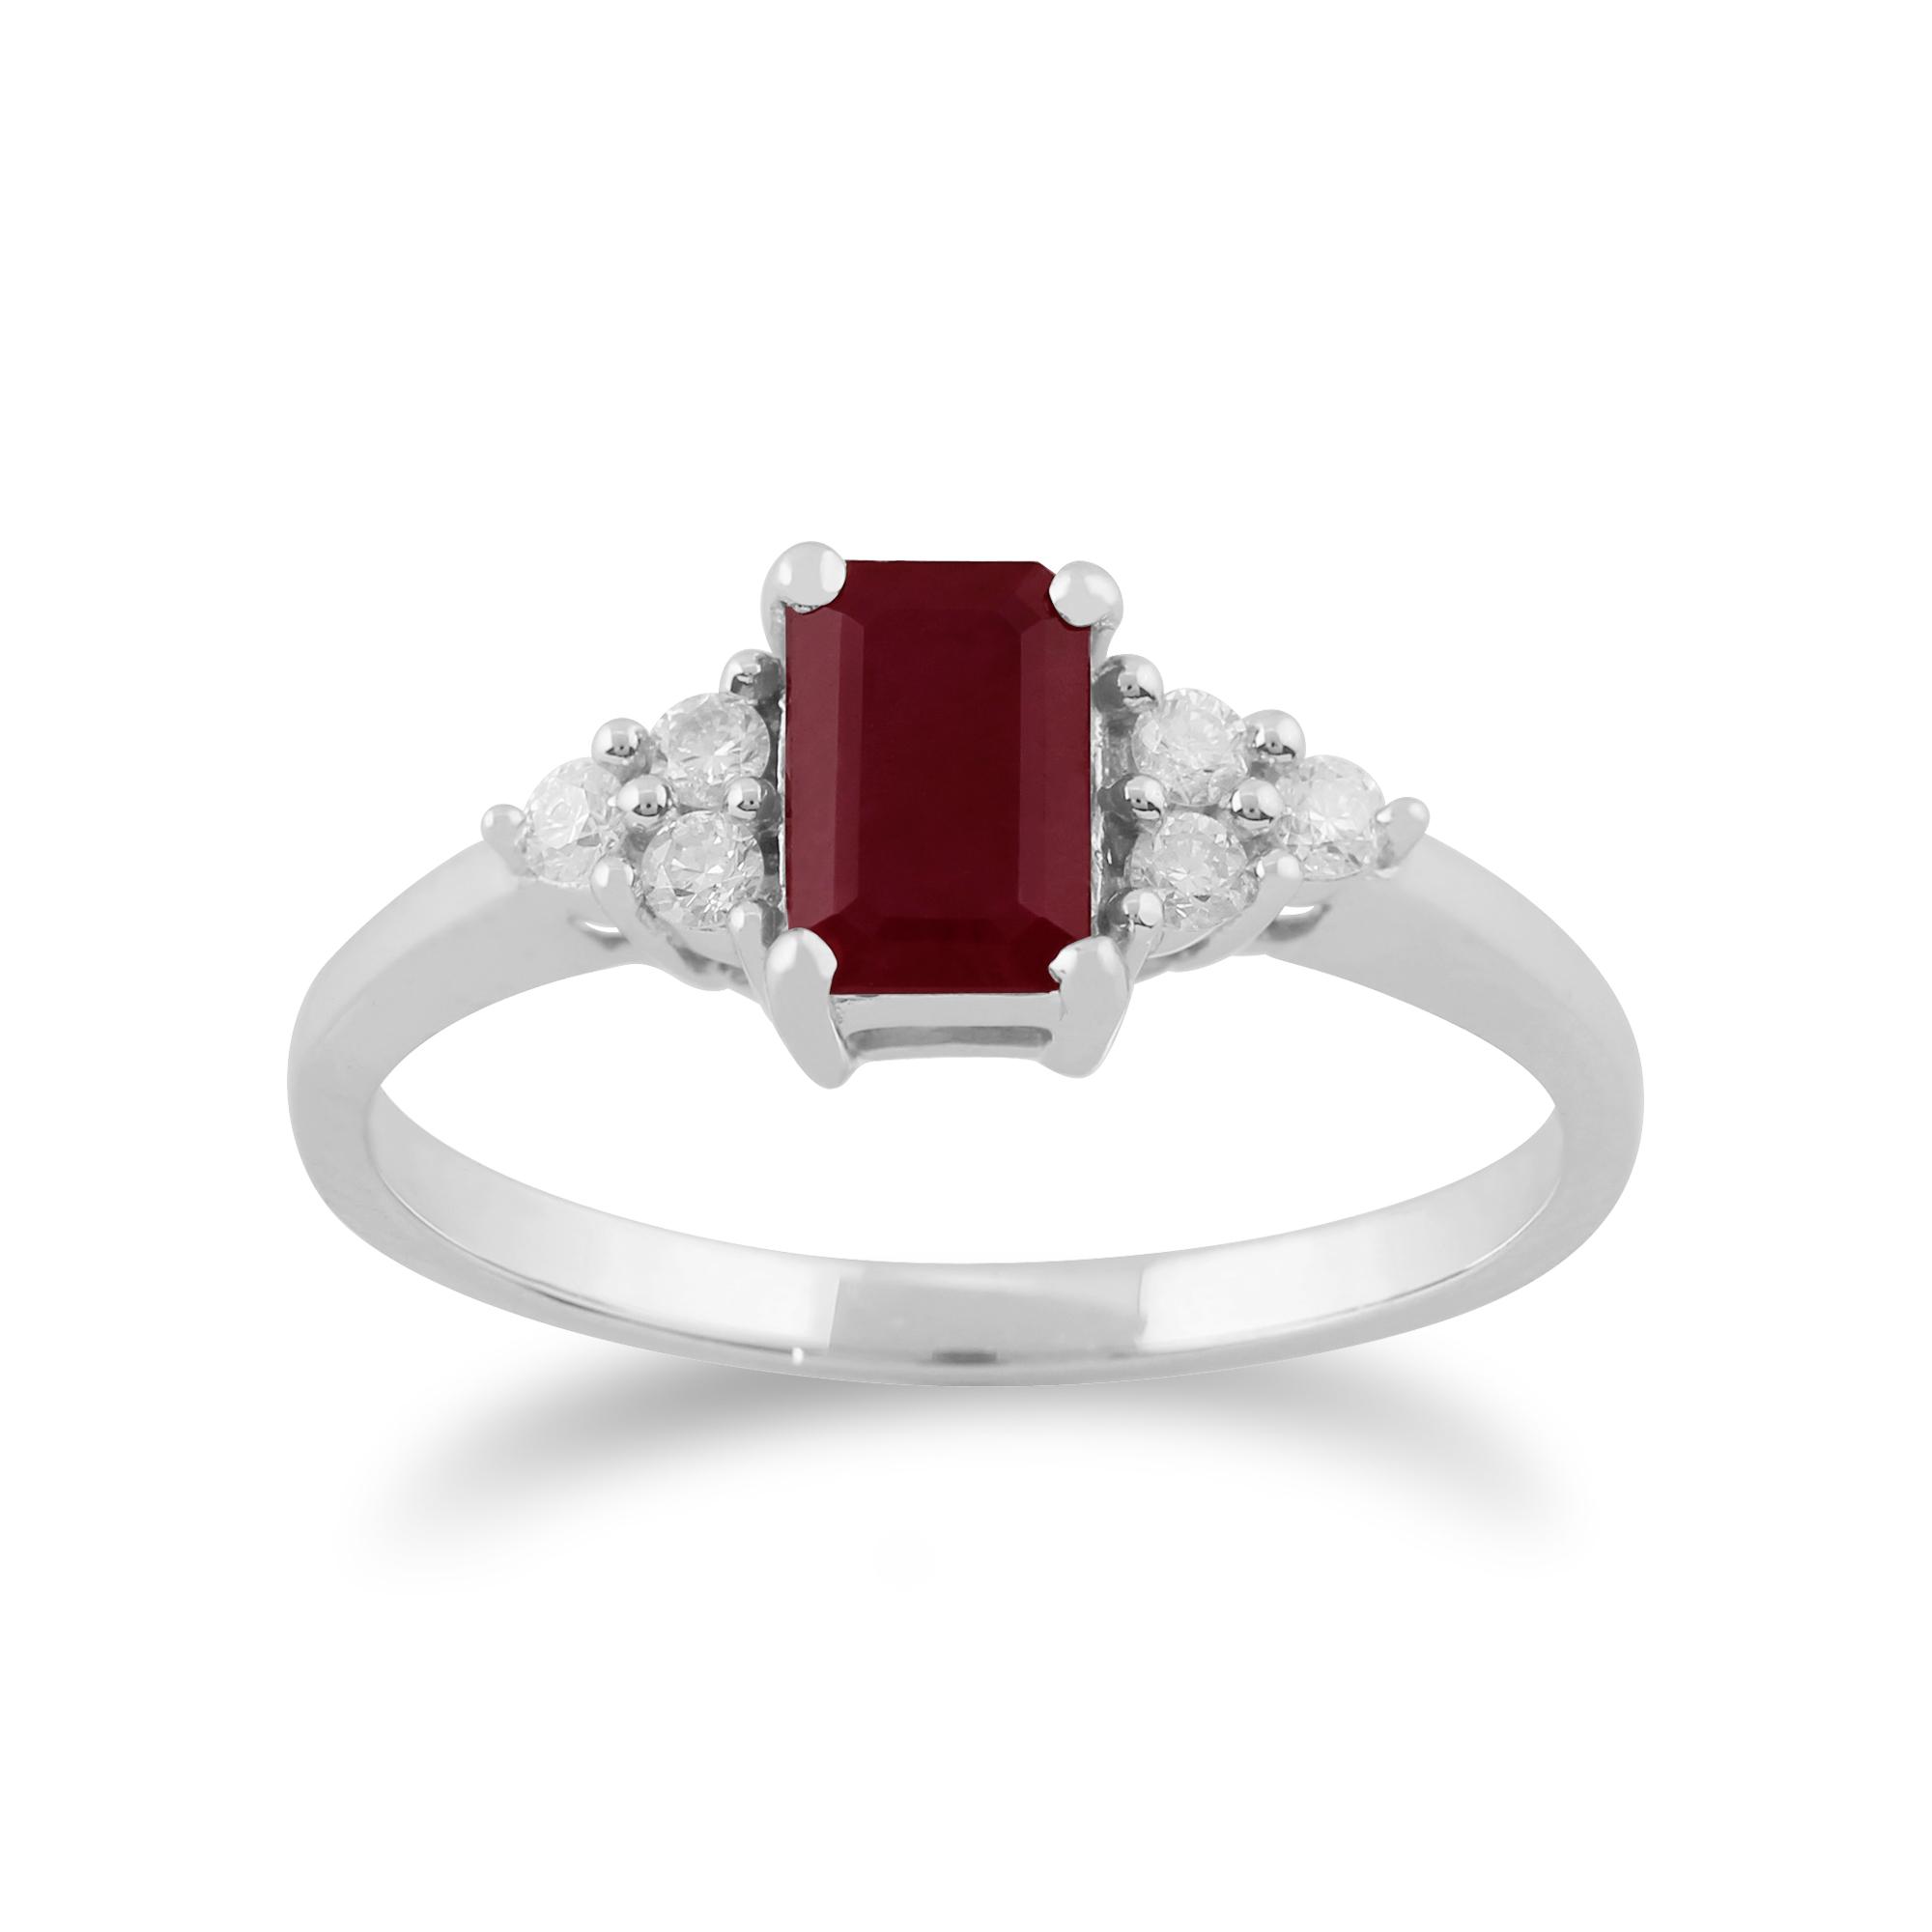 9ct White Gold 0.66ct Natural Ruby & Diamond Single Stone Ring Size: M